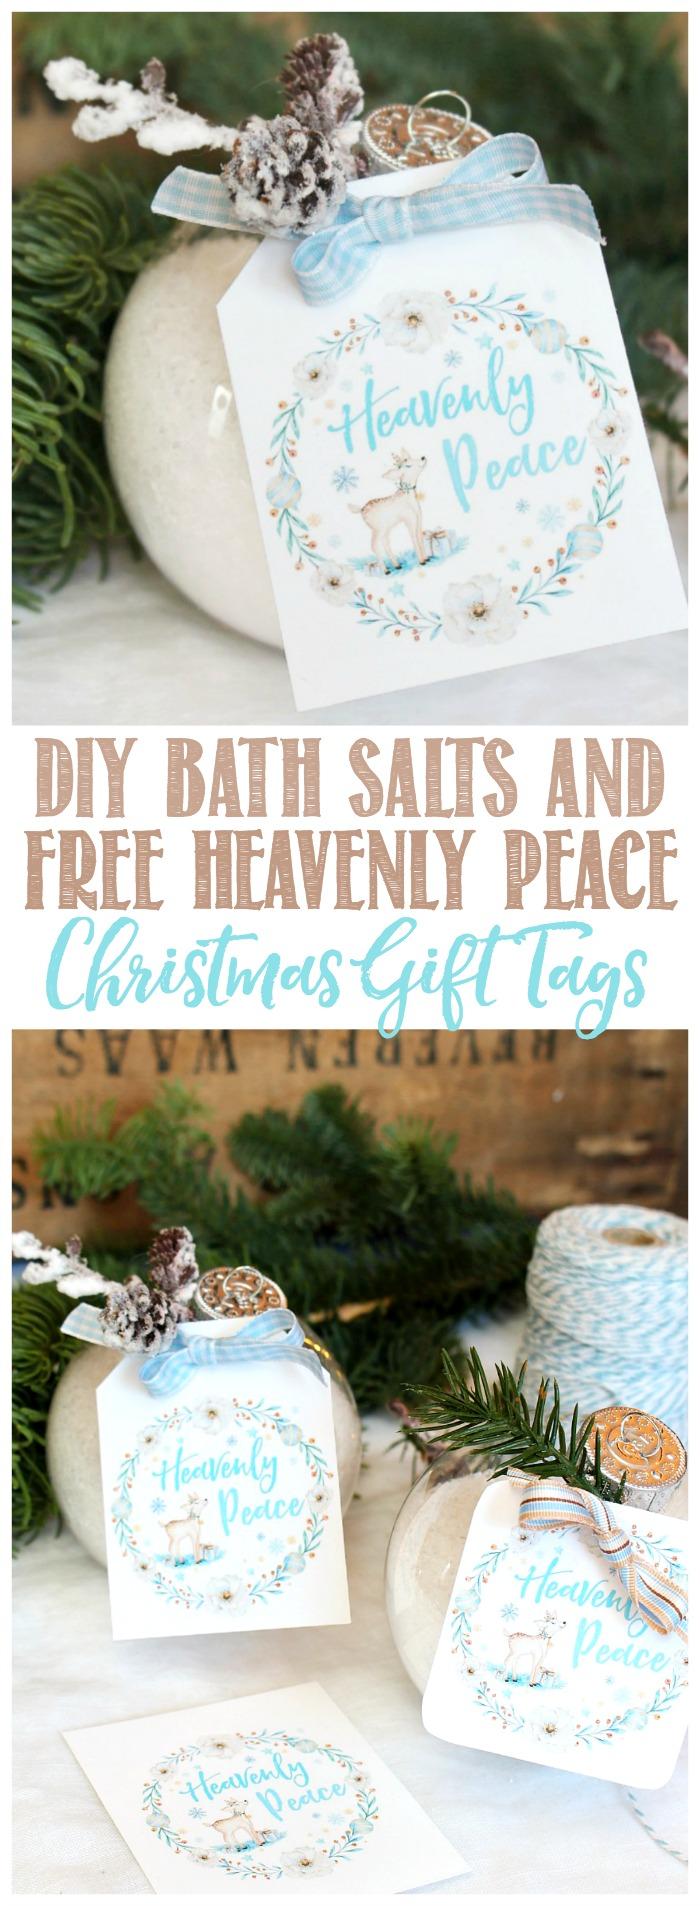 DIY Bath Salts Christmas Gift Idea and Free Heavenly Peace Christmas Gift Tags